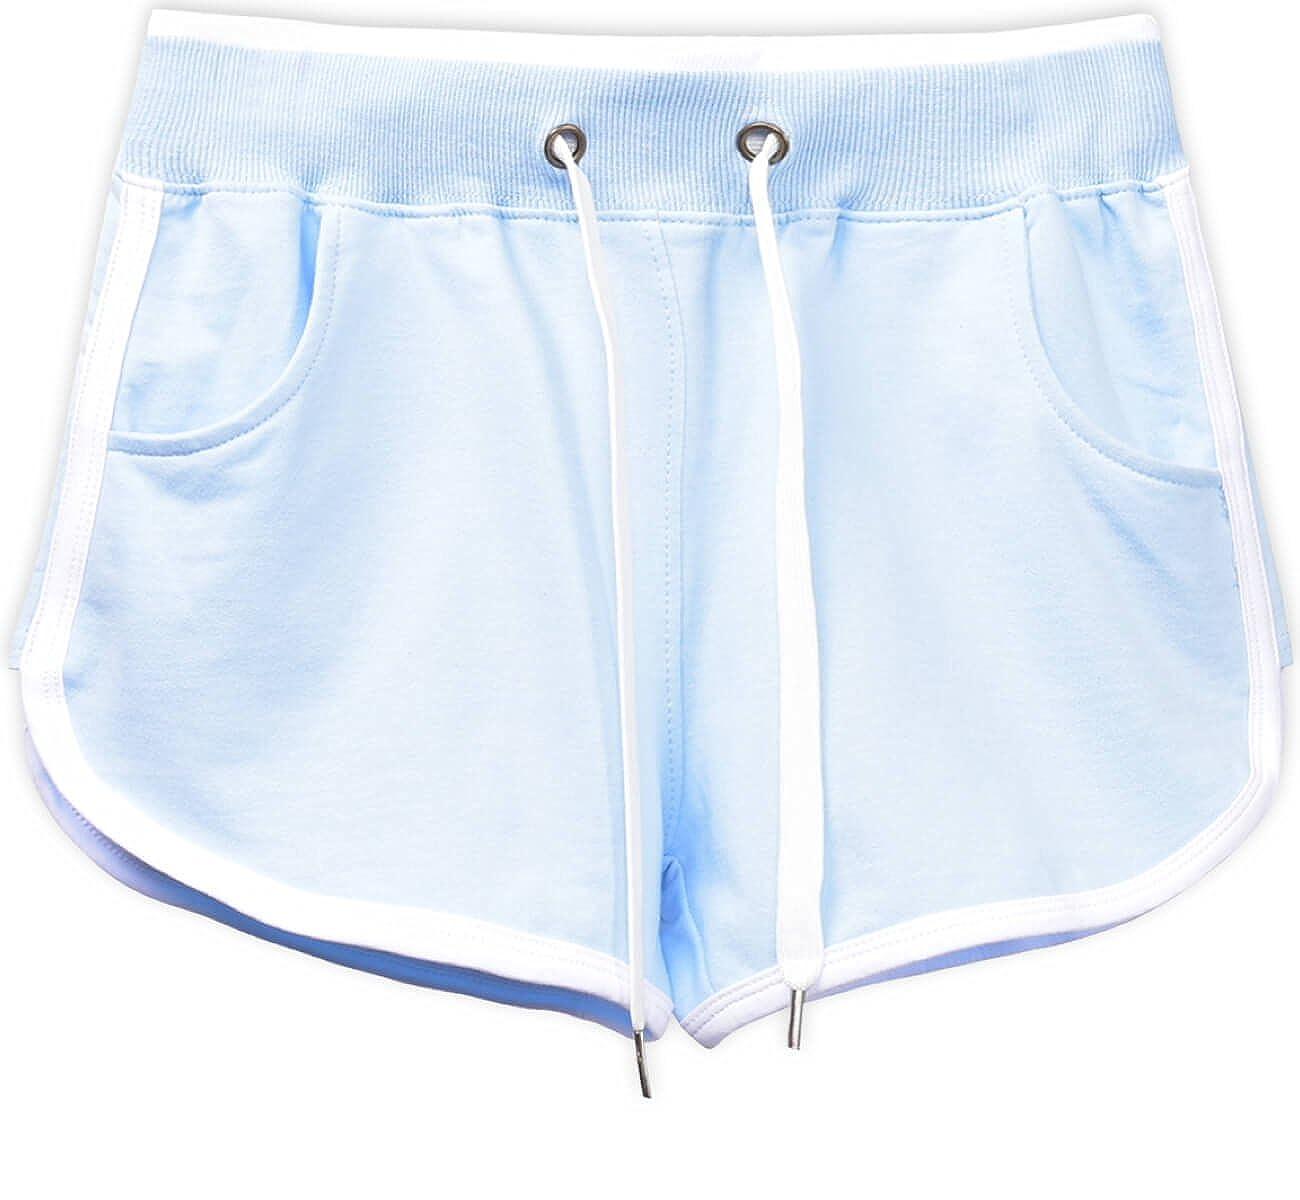 YooKa SHORTS レディース XL ブルー B074KCT9RC